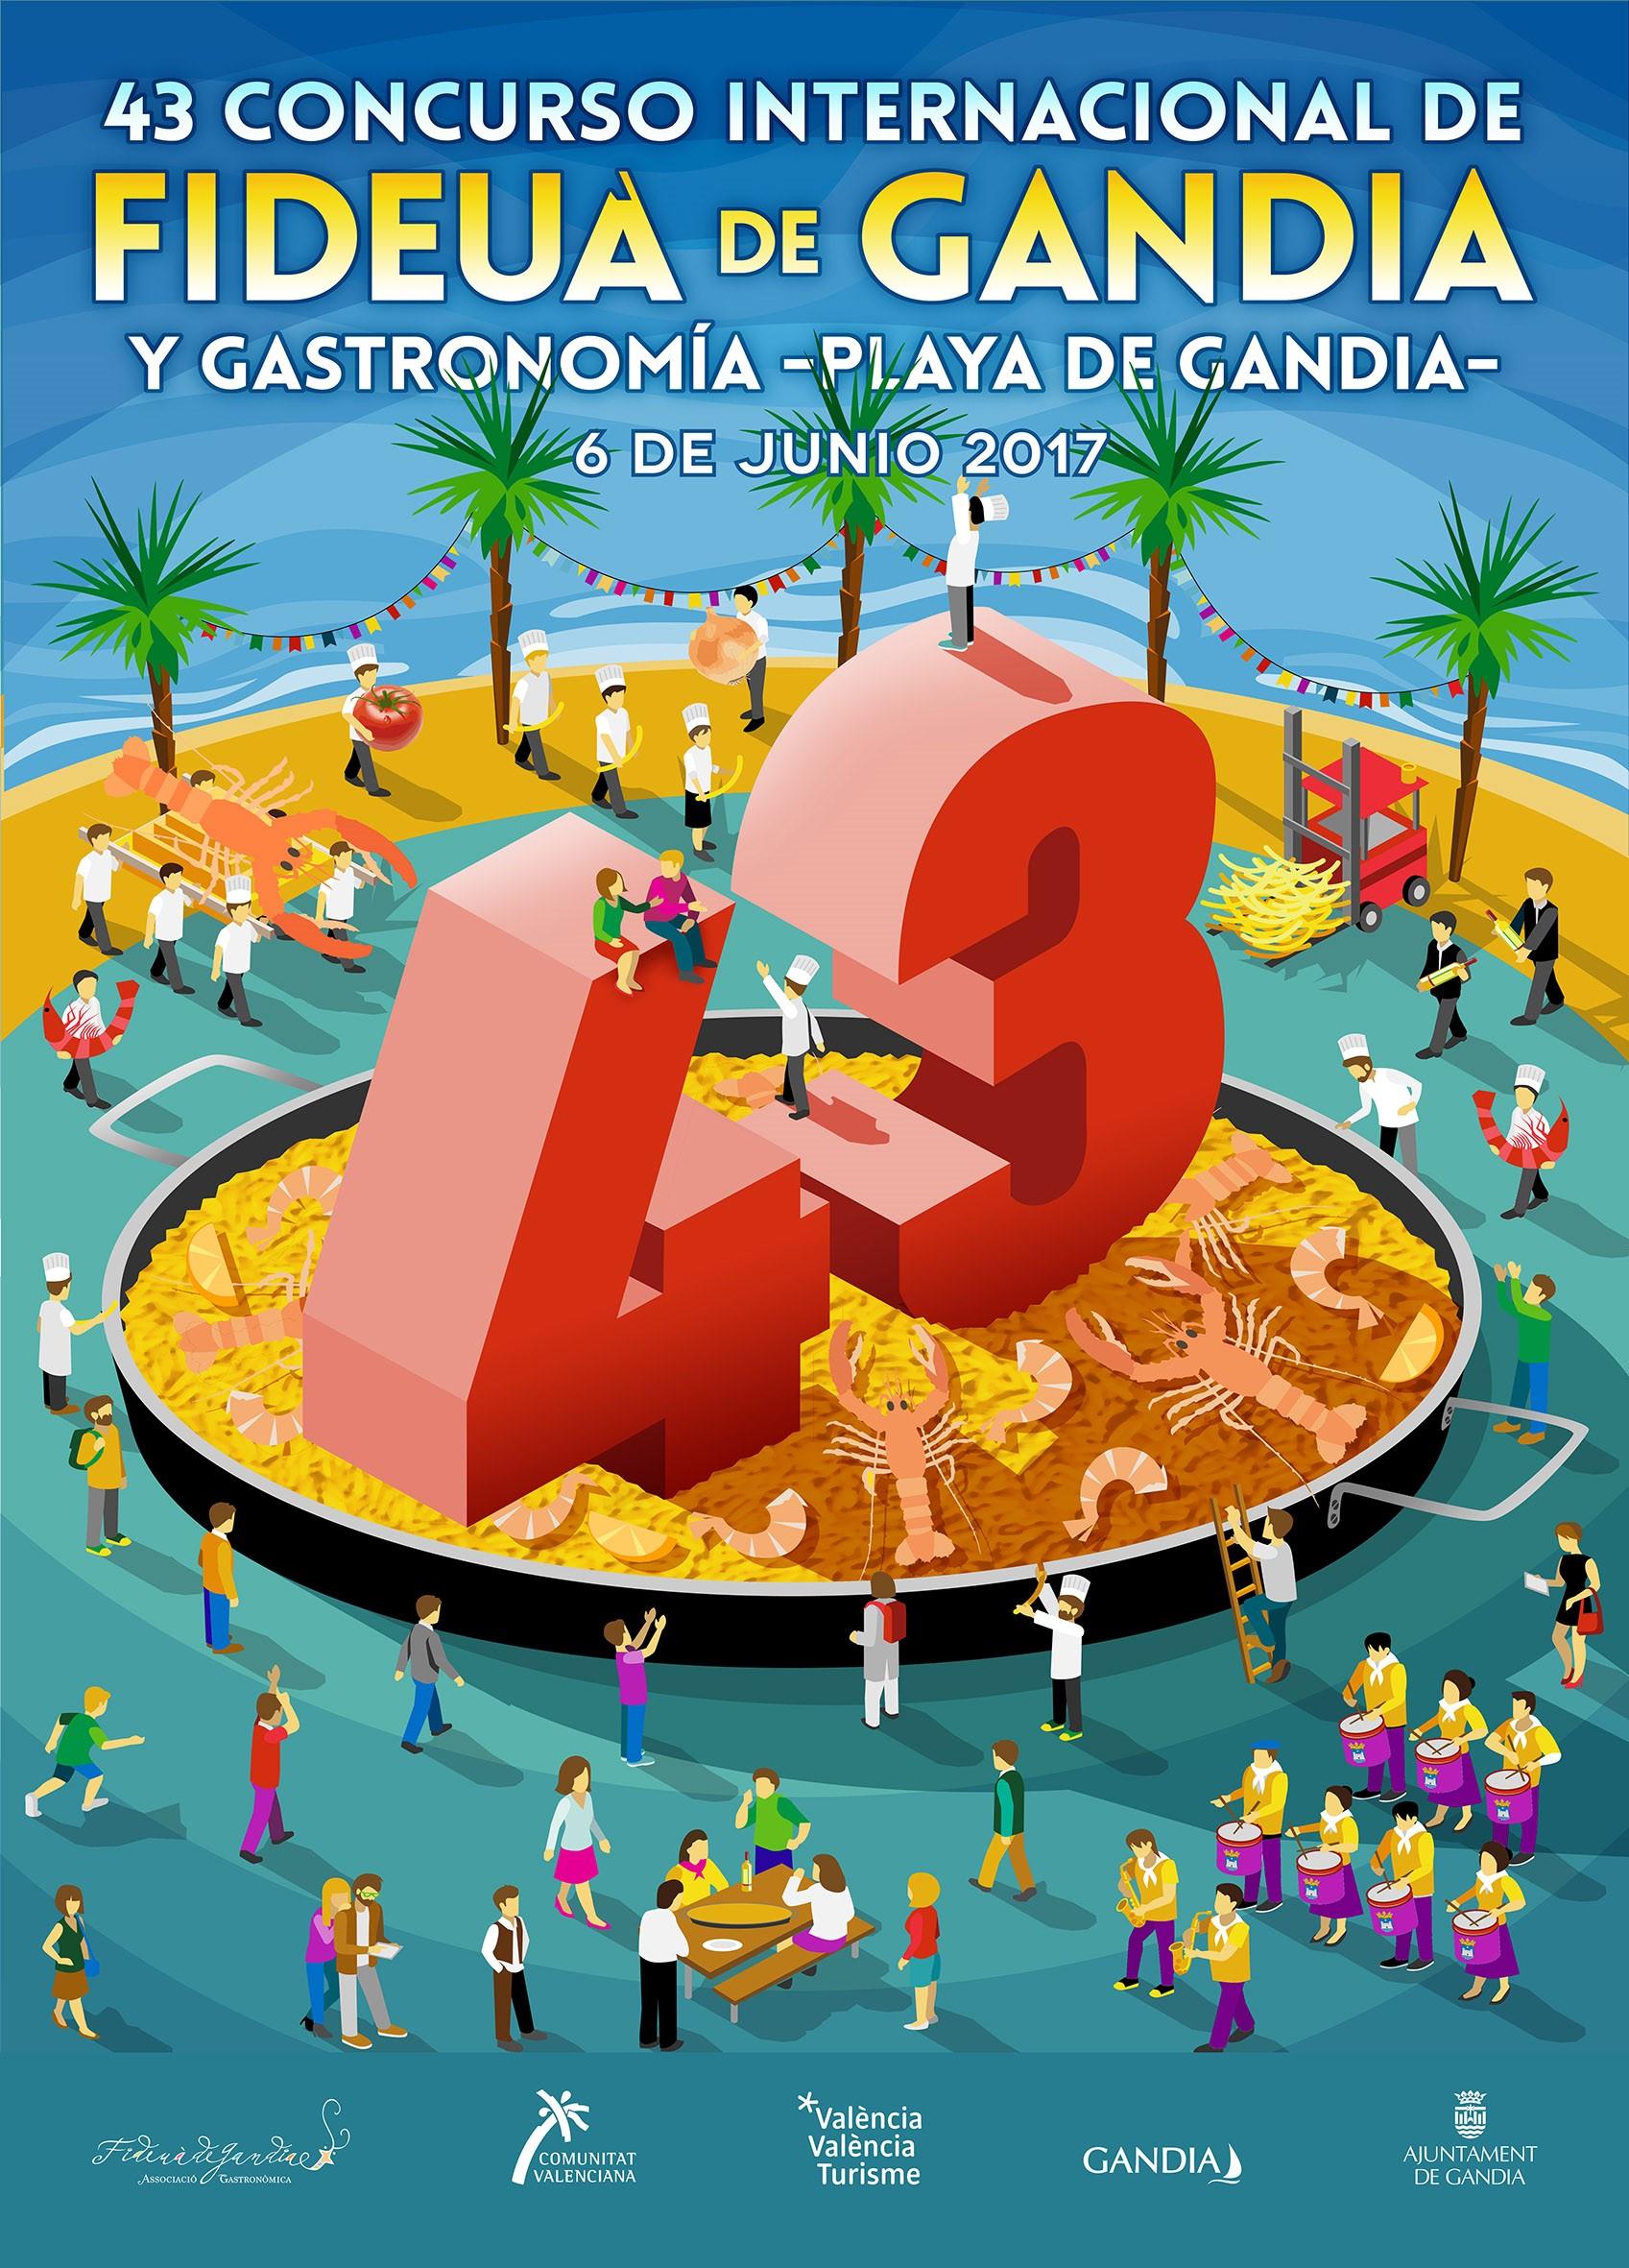 Ganador del concurso de carteles Fideua de Gandia 2017